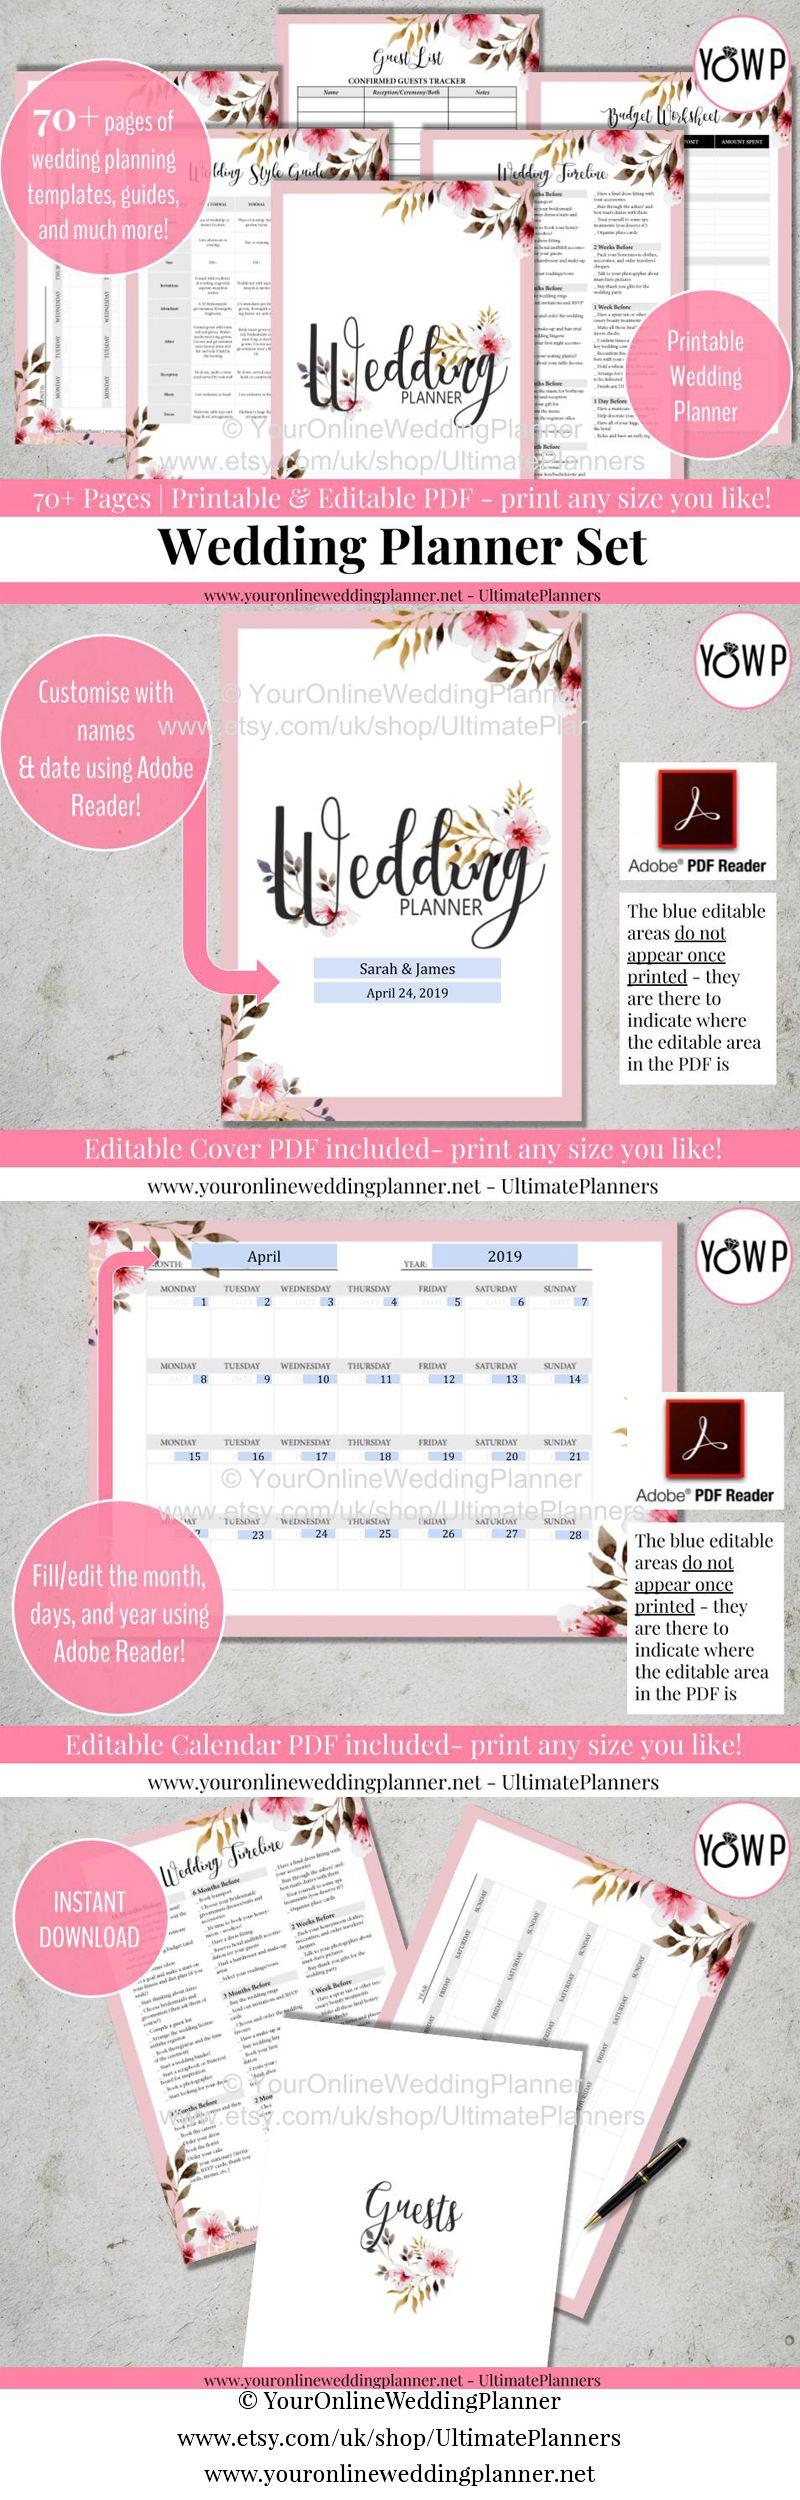 wedding planner printable editable wedding planner custom